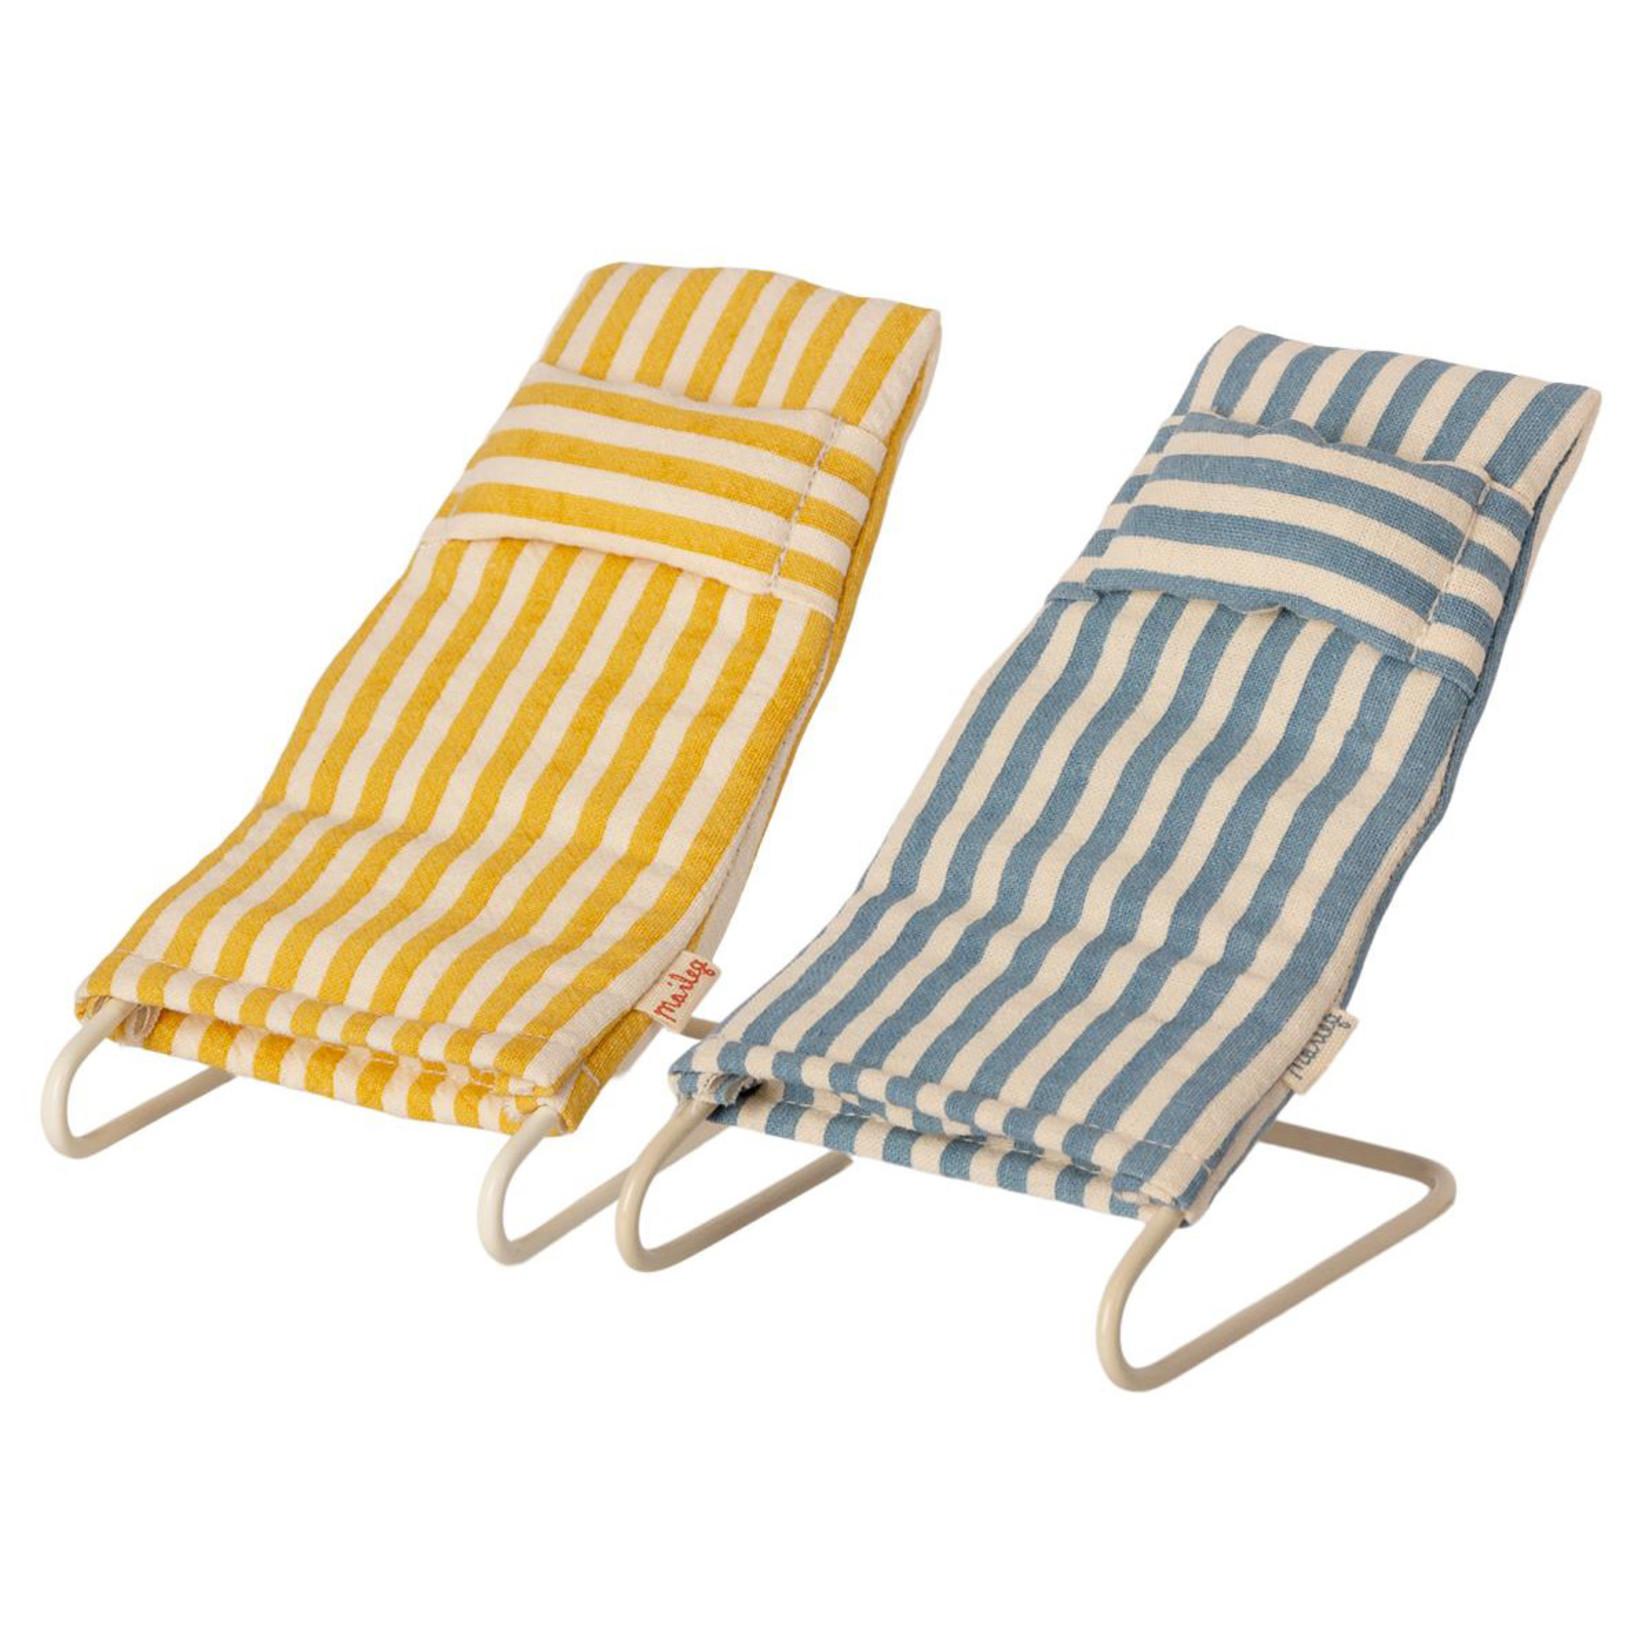 Maileg Maileg Beach chair set, Mouse